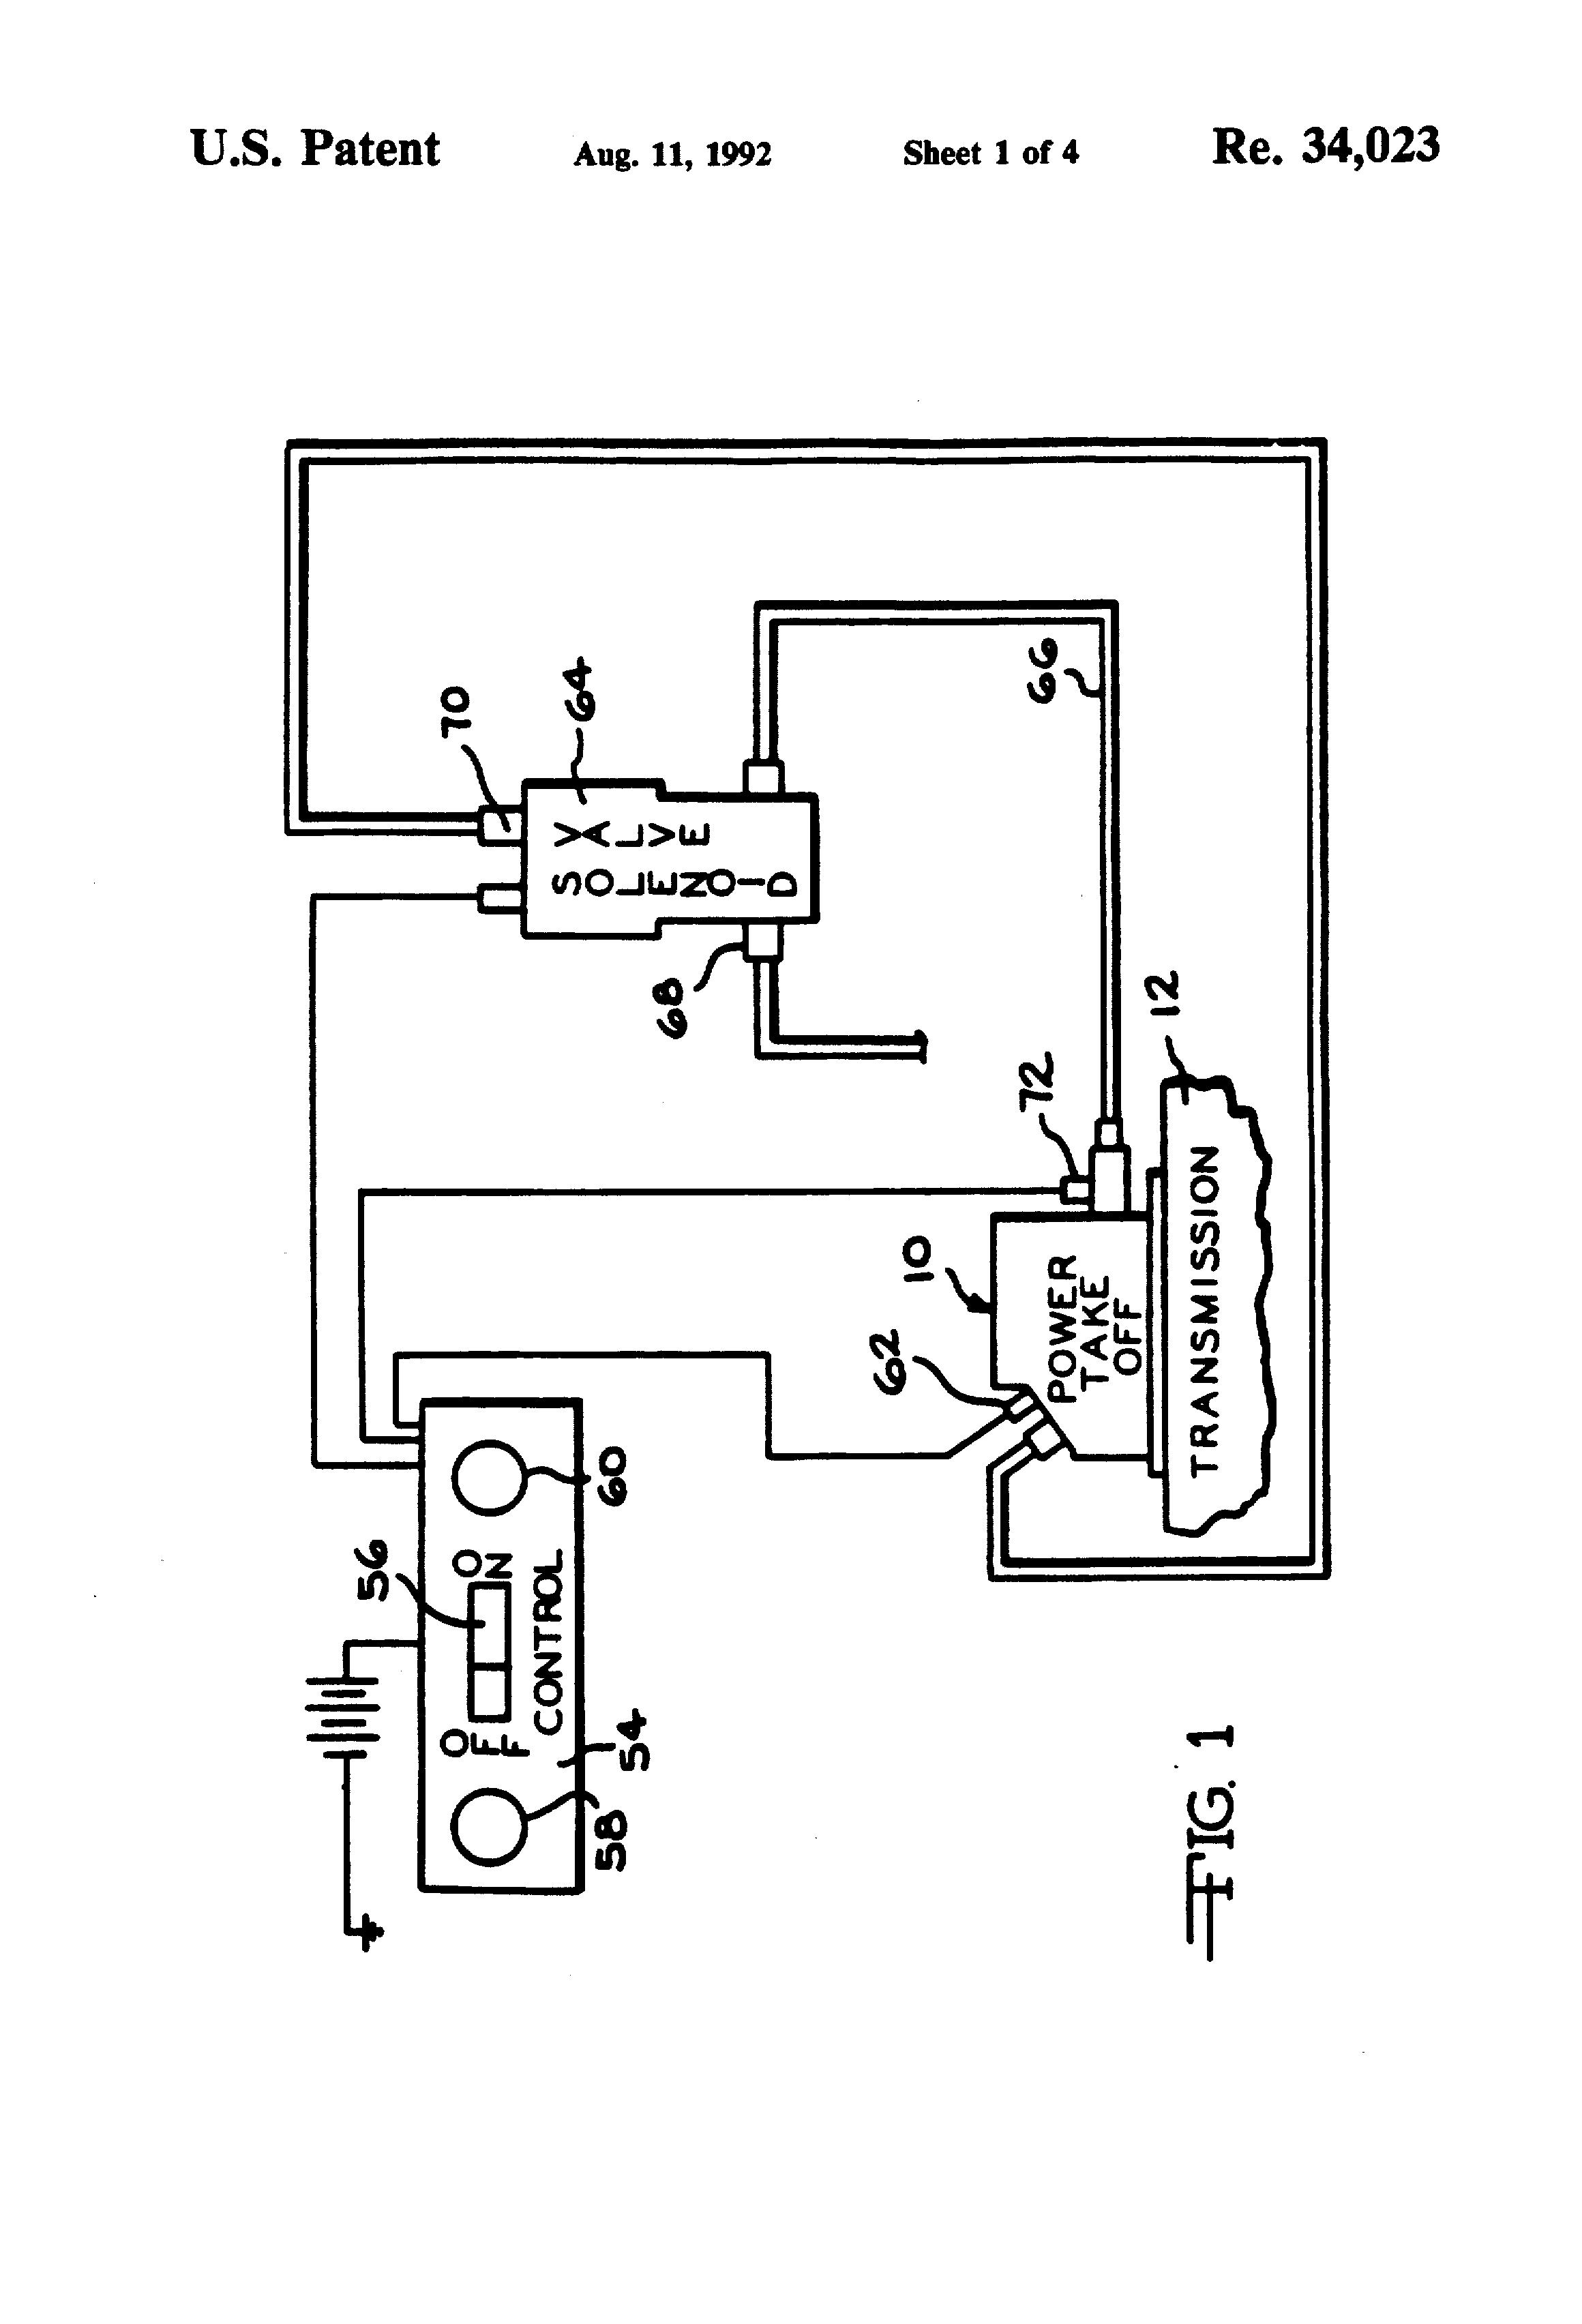 Muncie Pto Pressure Switch Wiring Diagram - Nissan 300zx Engine Diagram  Intake - ace-wiring.yenpancane.jeanjaures37.fr   Muncie Pto Pressure Switch Wiring Diagram      Wiring Diagram Resource